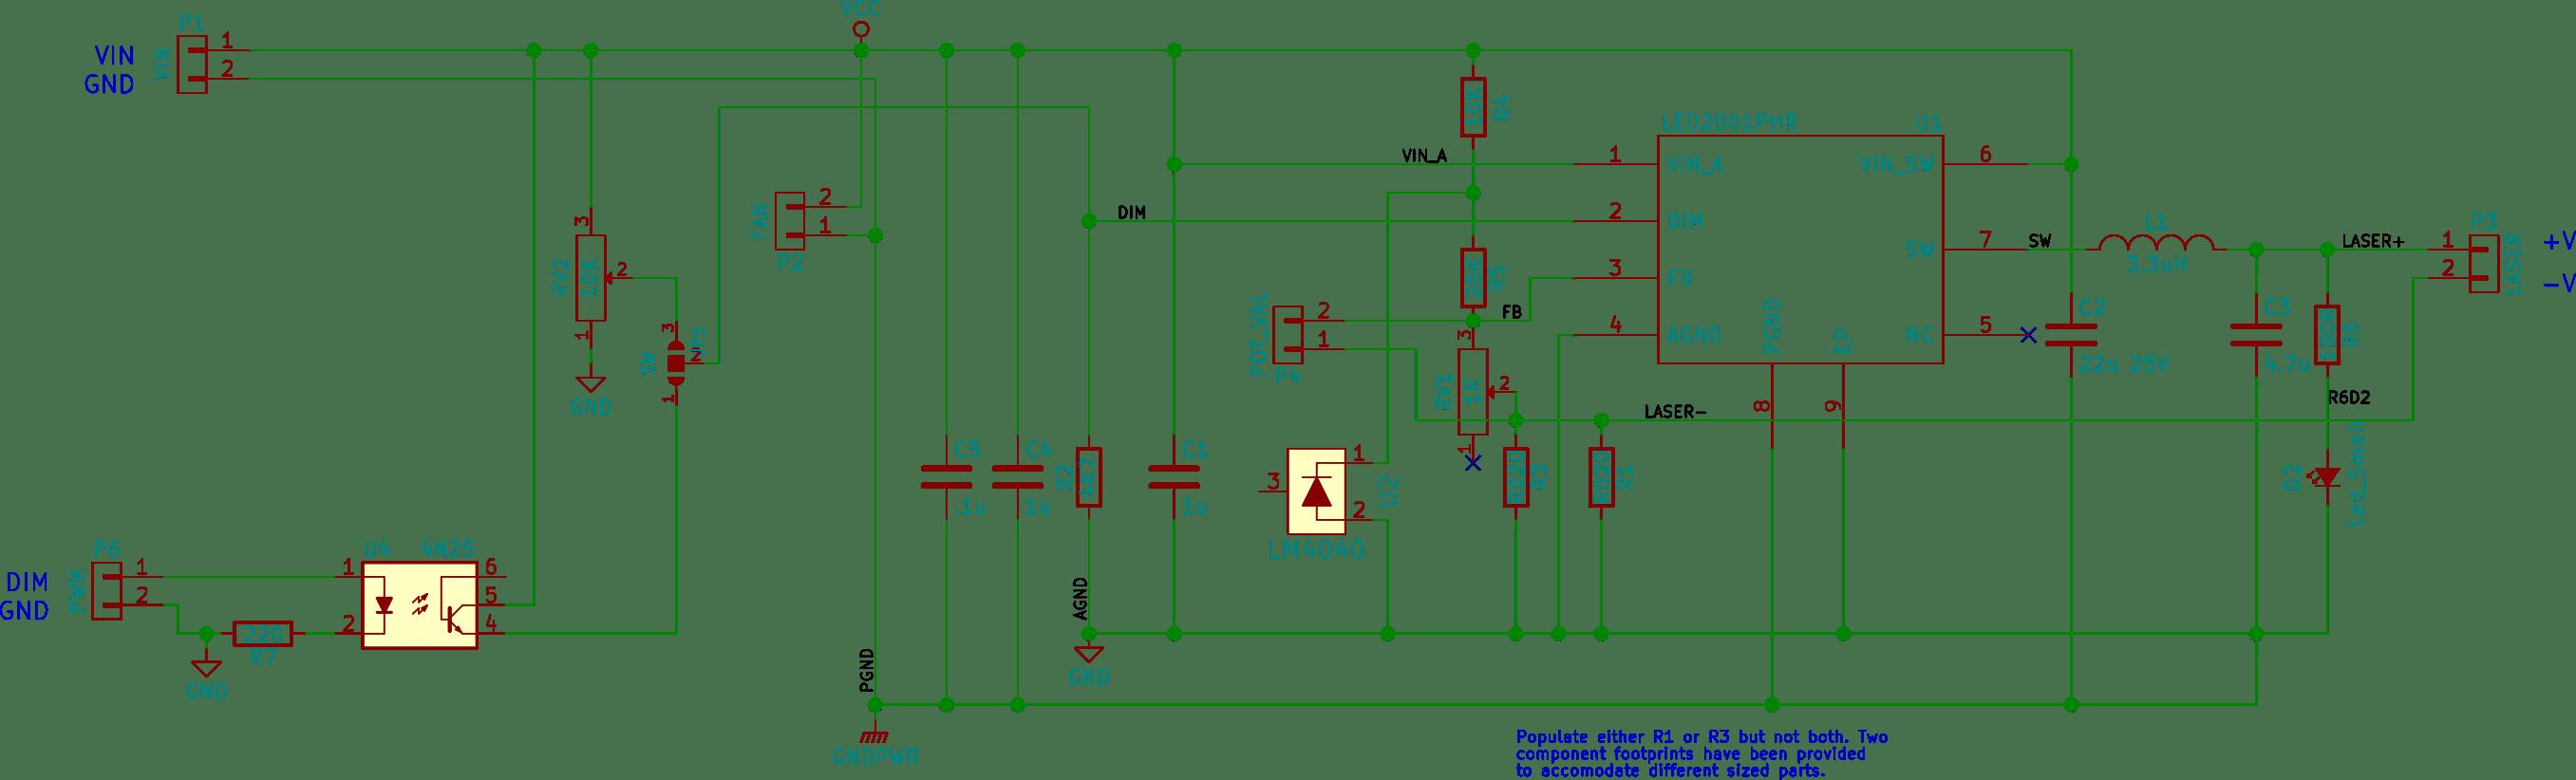 PWM_CC_laserdriver_v5.schematic